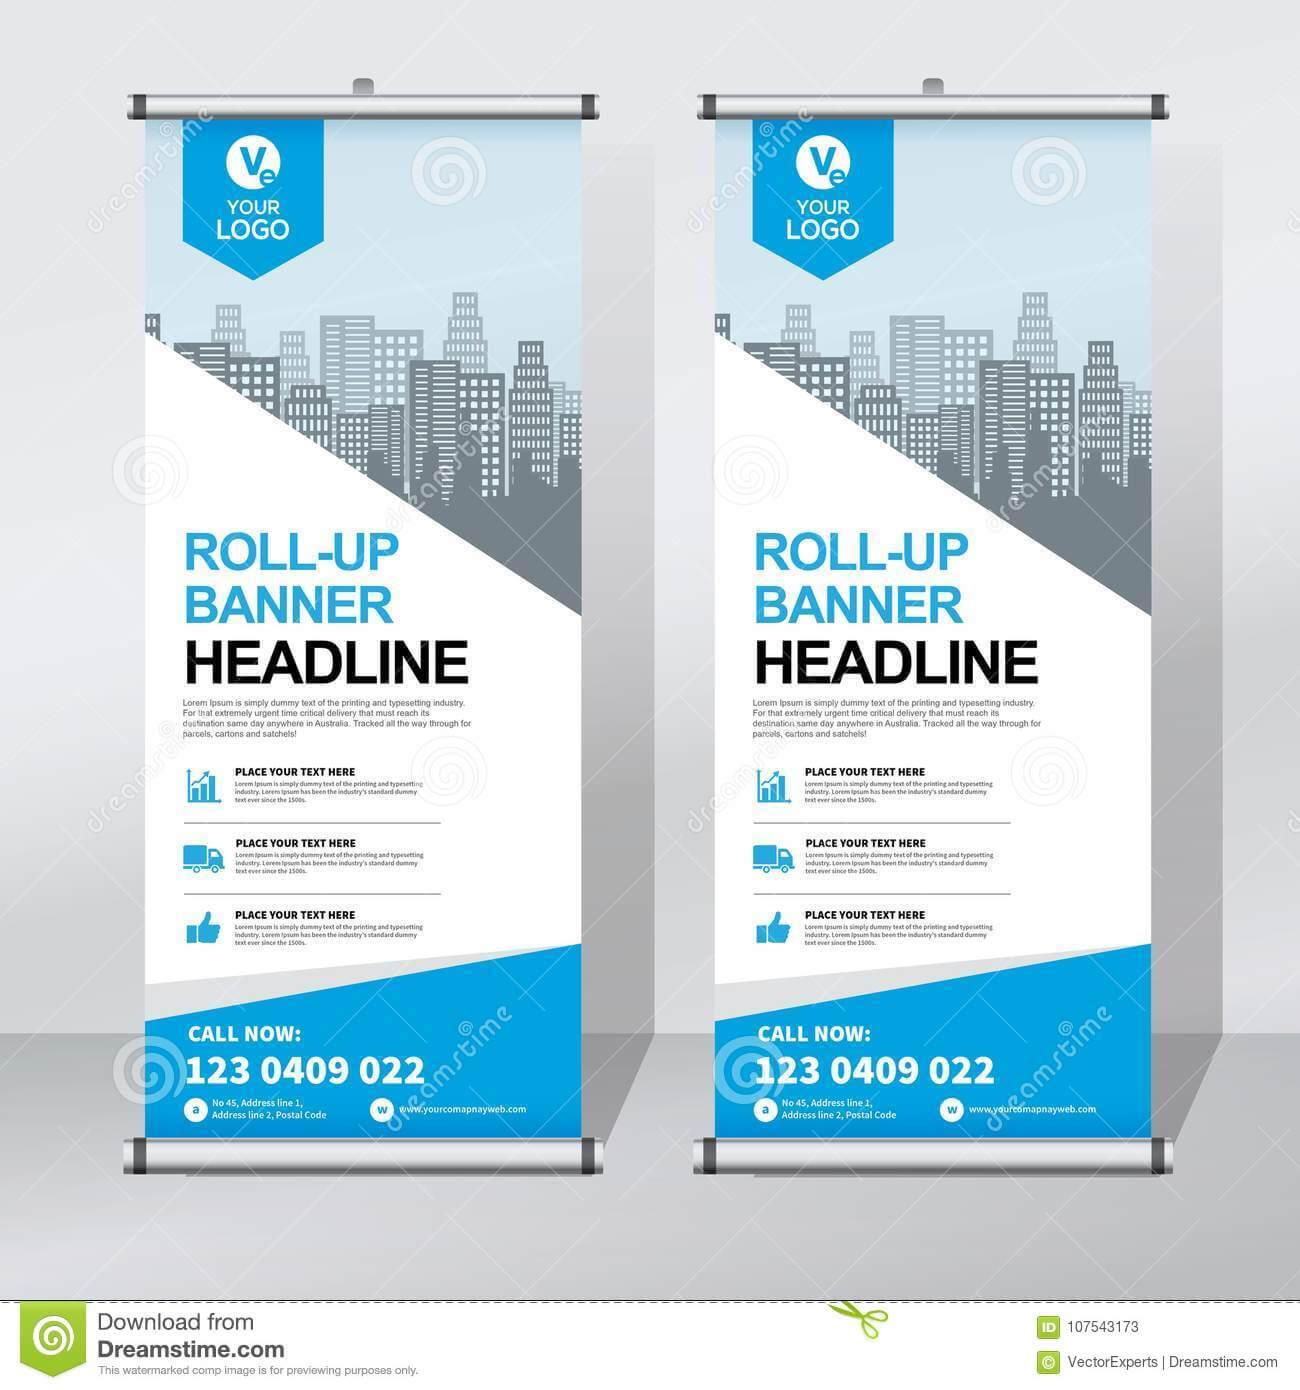 Roll Up Banner Design Template, Vertical, Abstract Intended For Pop Up Banner Design Template